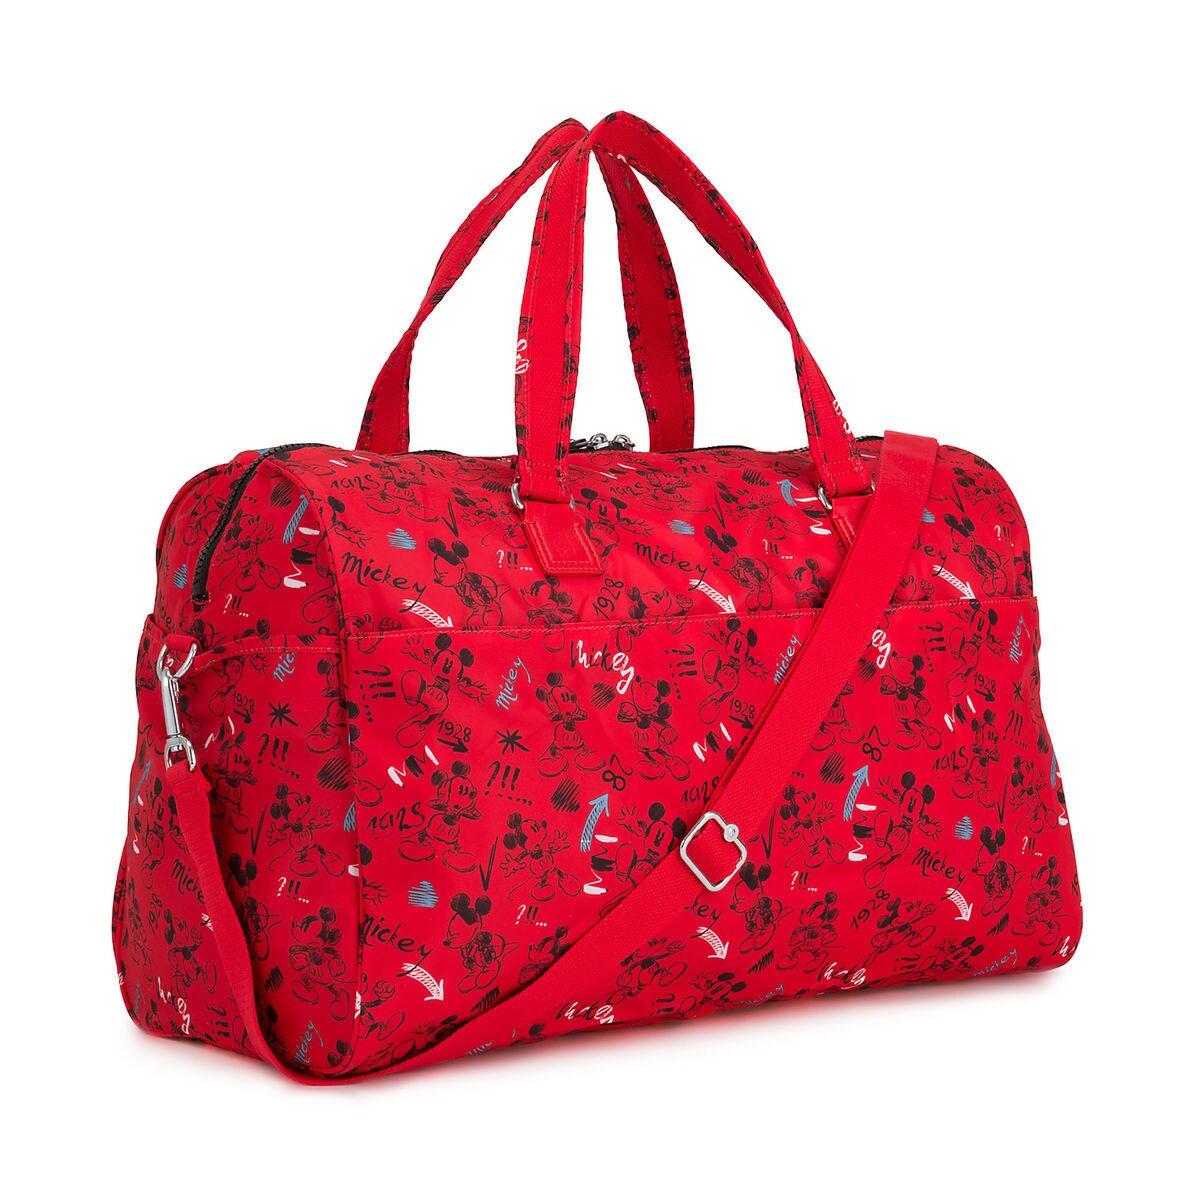 73a1da9b0344 Mickey Mouse Sketch Art Duffle Bag by Kipling